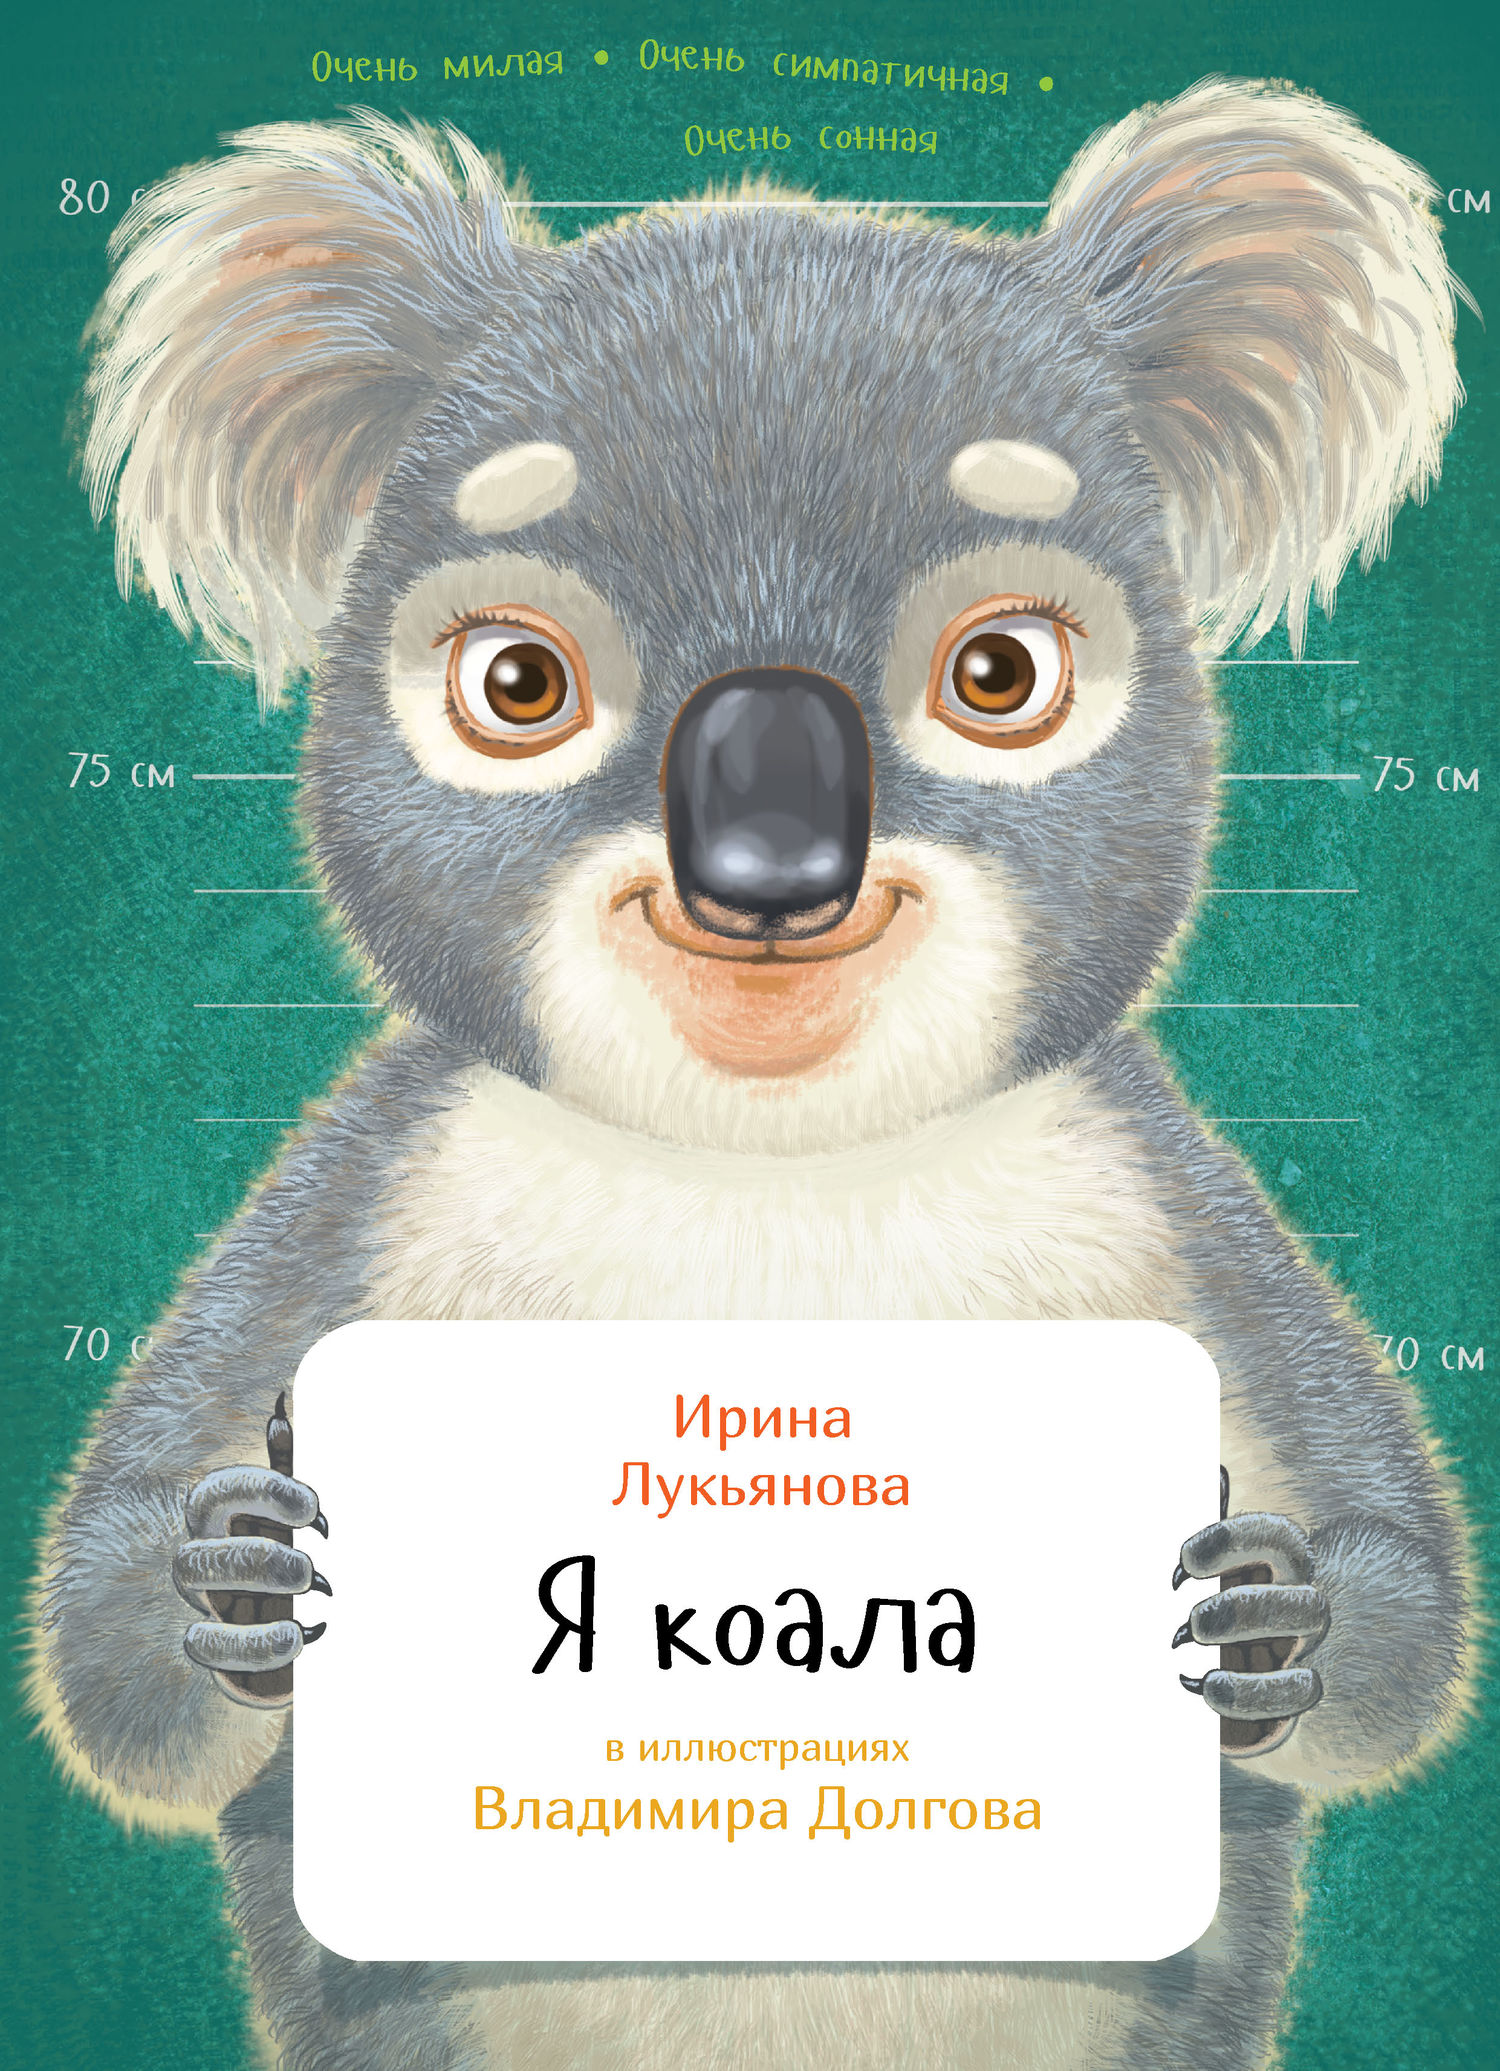 Ирина Лукьянова бесплатно